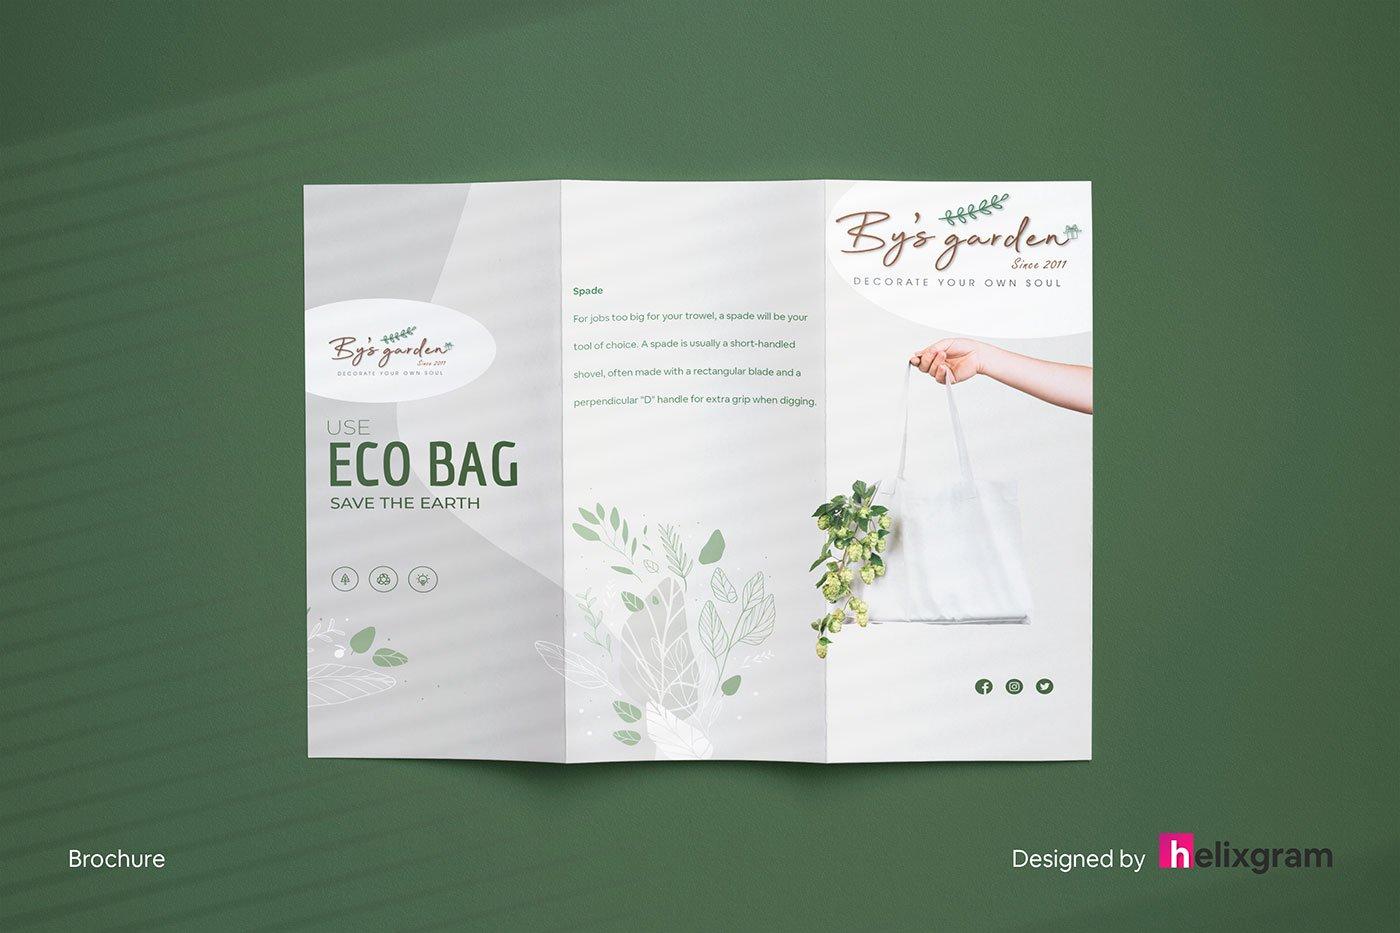 Brand-Identity-Design-Flyer-Poster-By's-Garden-visual-identity-design-package-corporate-identity-design-logo-design-flyer-poster-book-cover-design-web-design-digital-advertising-design-Helixgram